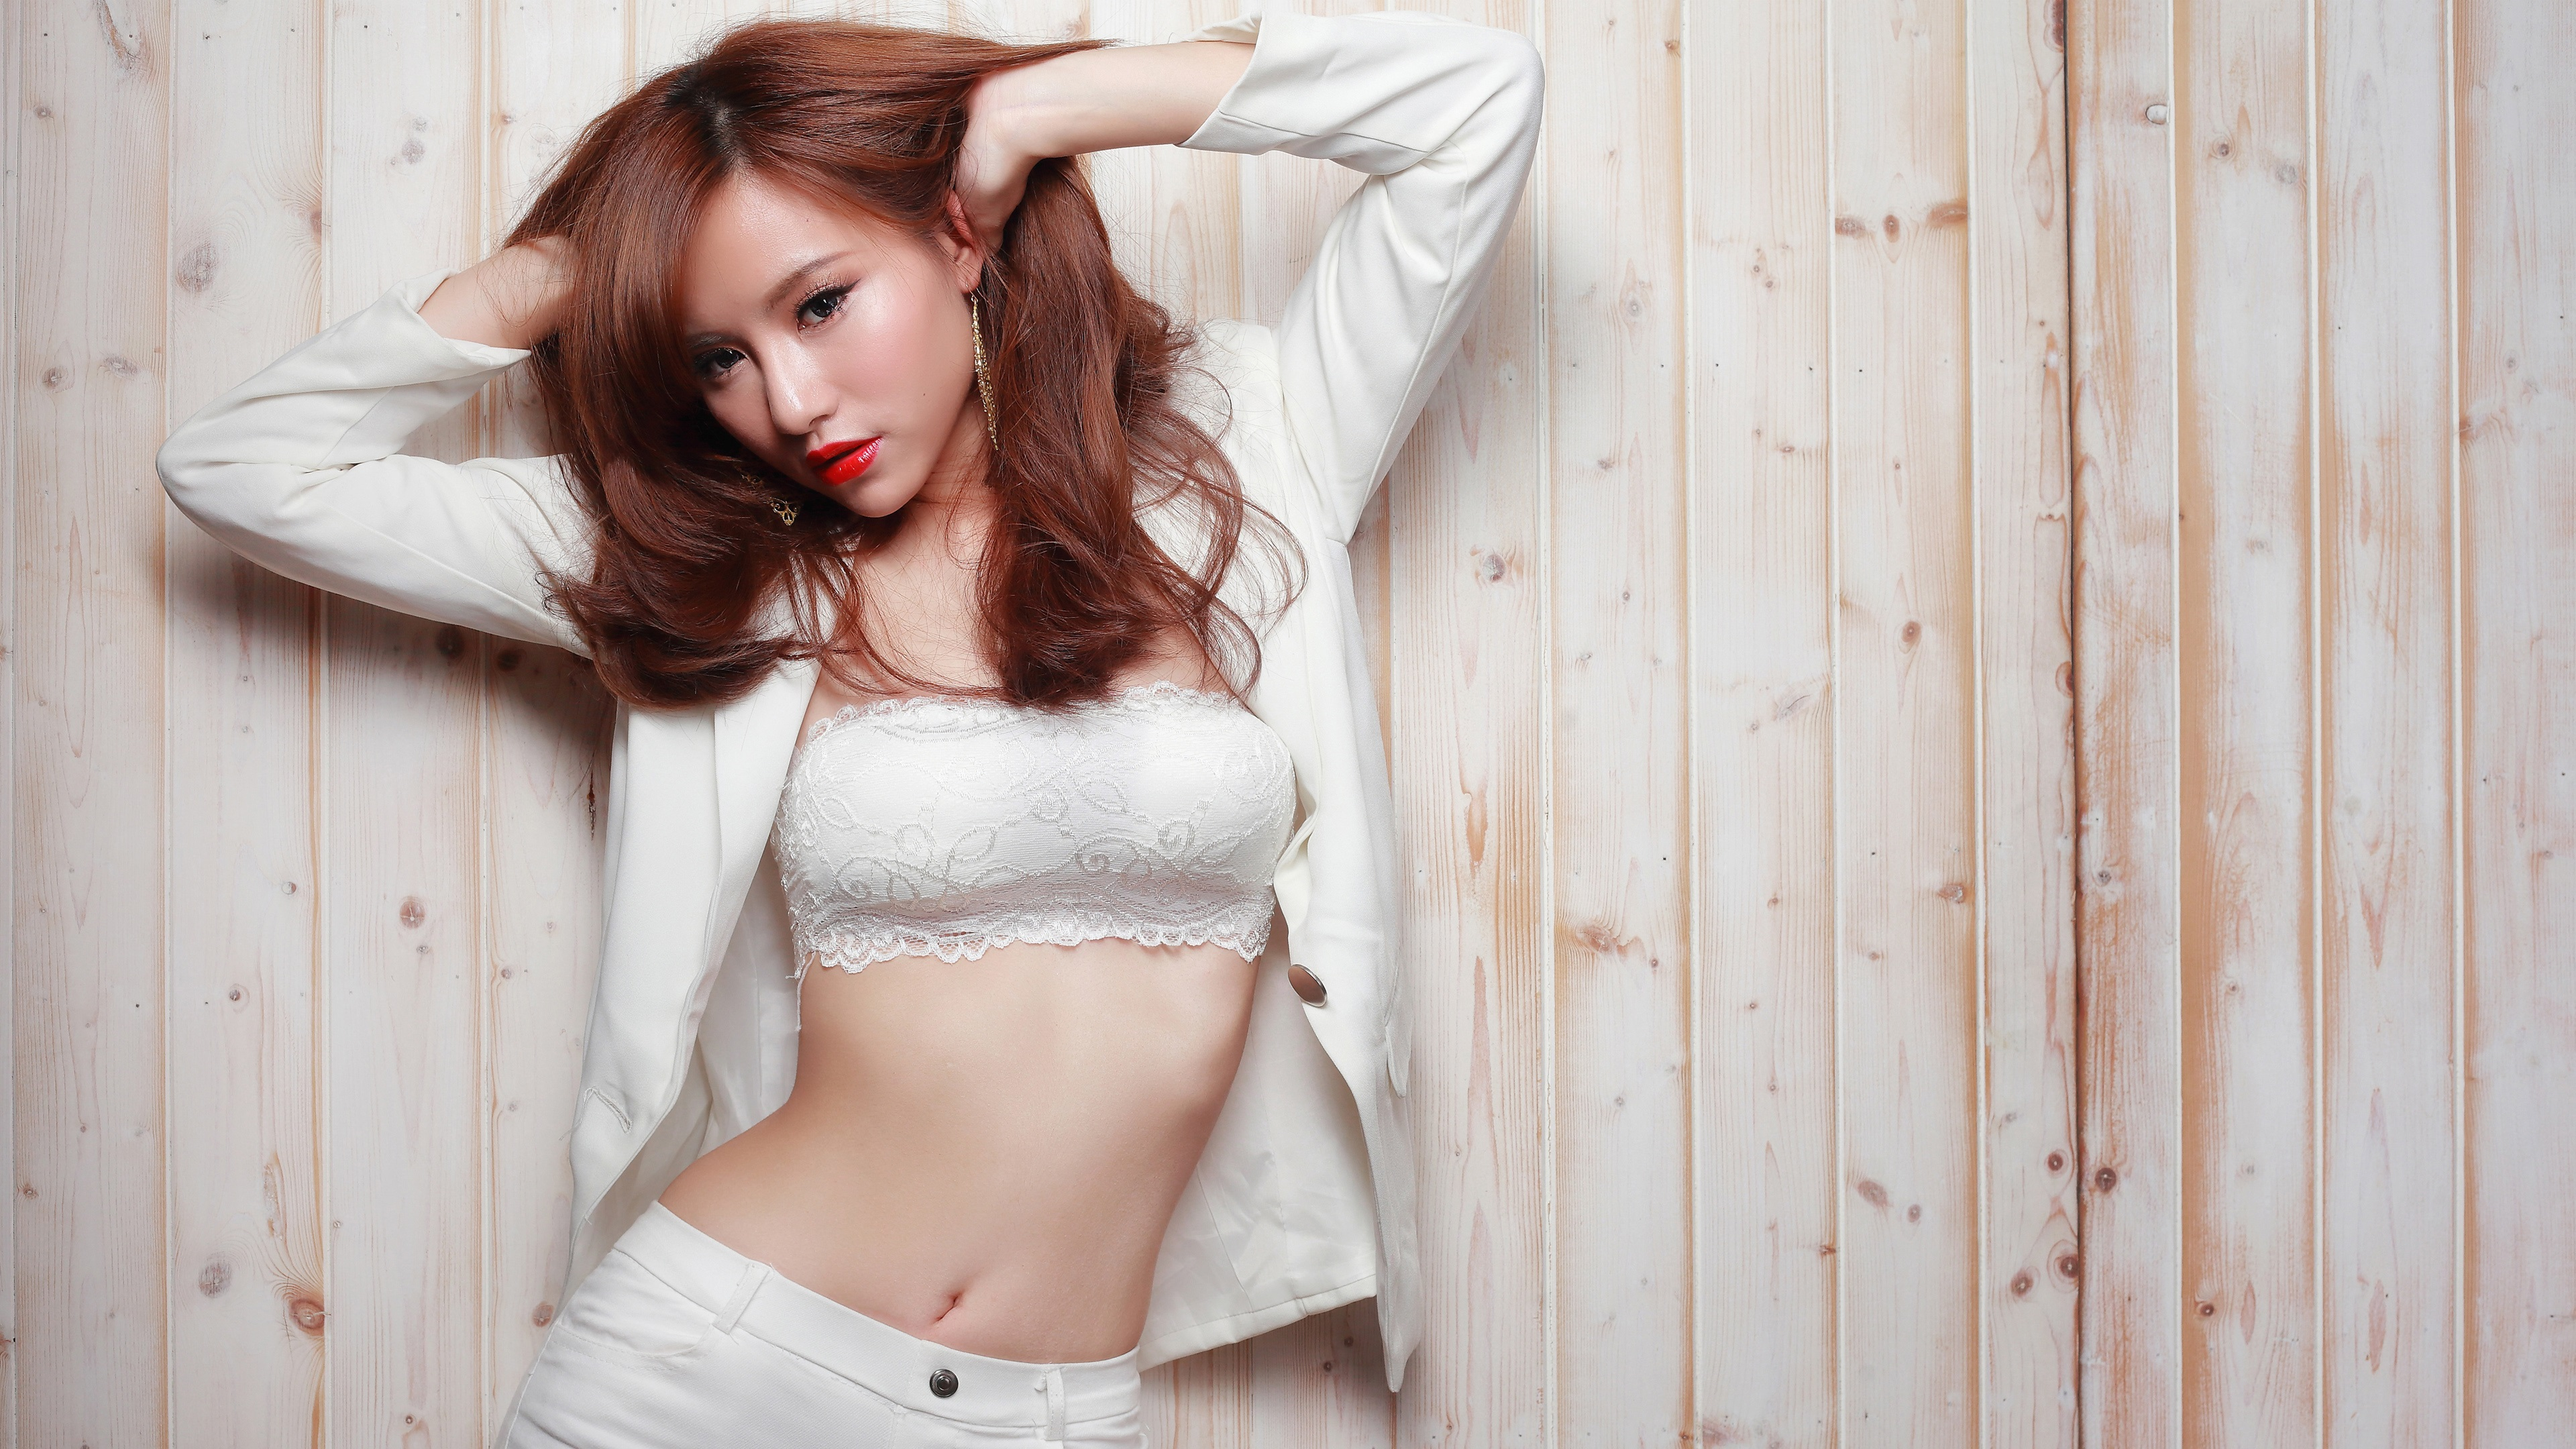 Kleid Uhd MädchenPoseMake Lippen 3840x2160 Weißes UpRote Asian b6yf7gY